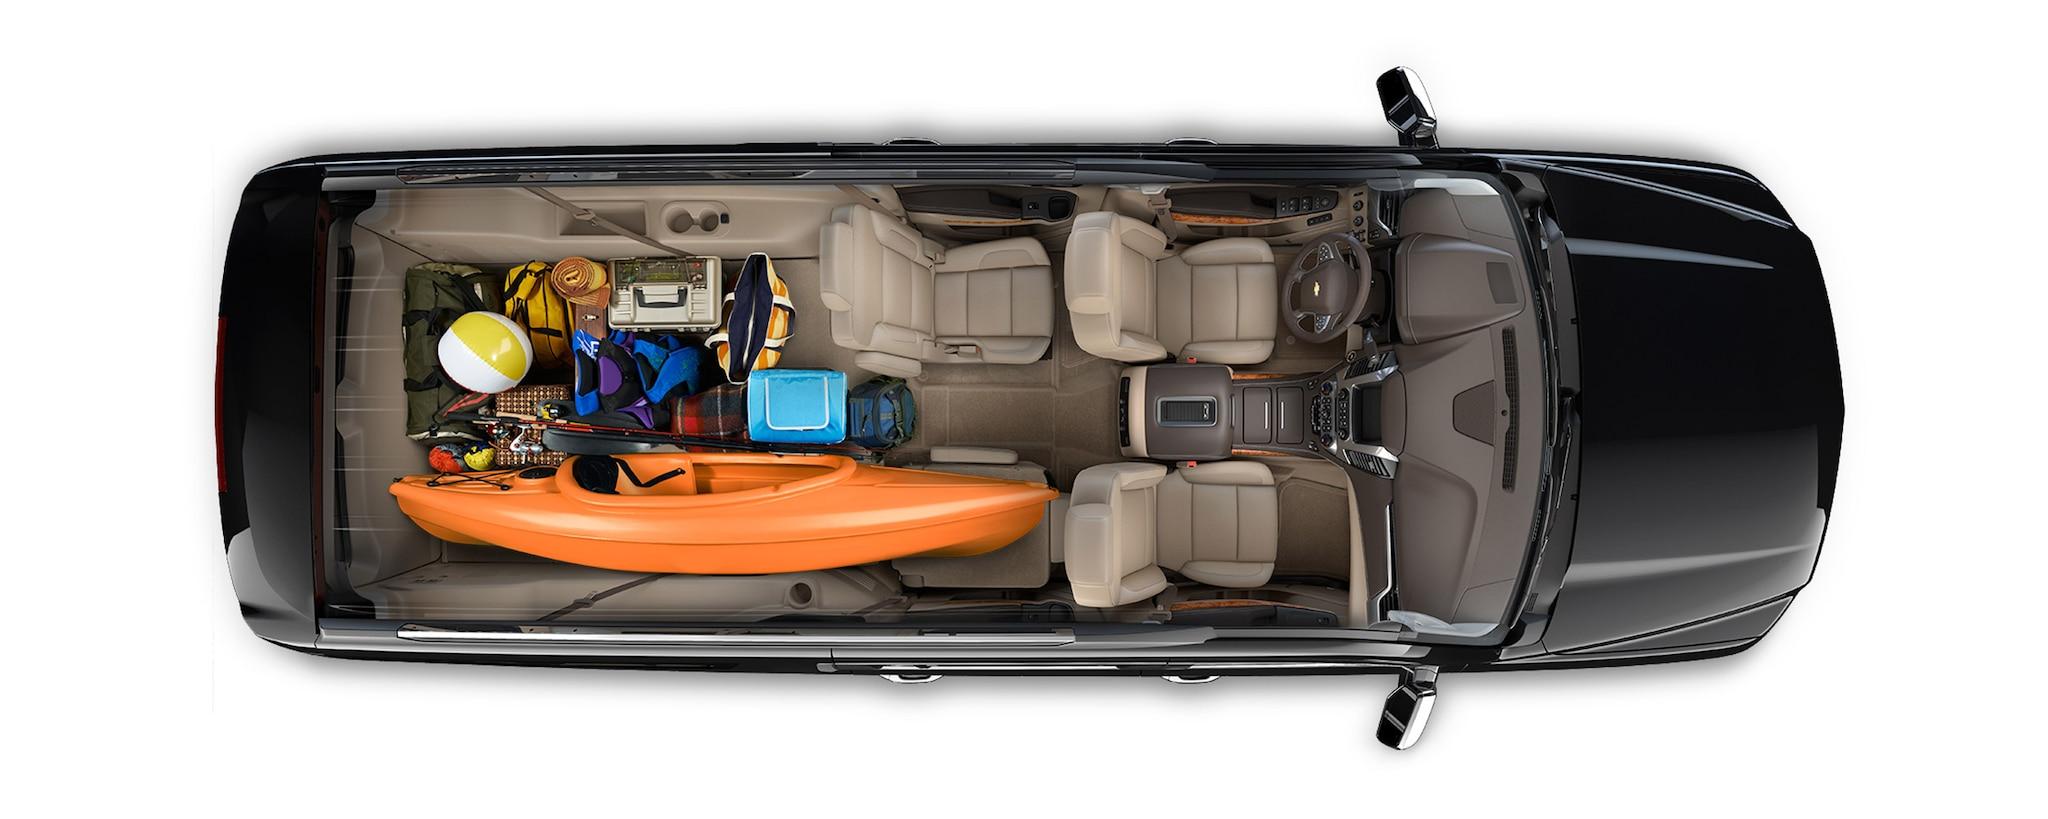 Diseño de SUV Suburban 2020: carga interior-viaje familiar